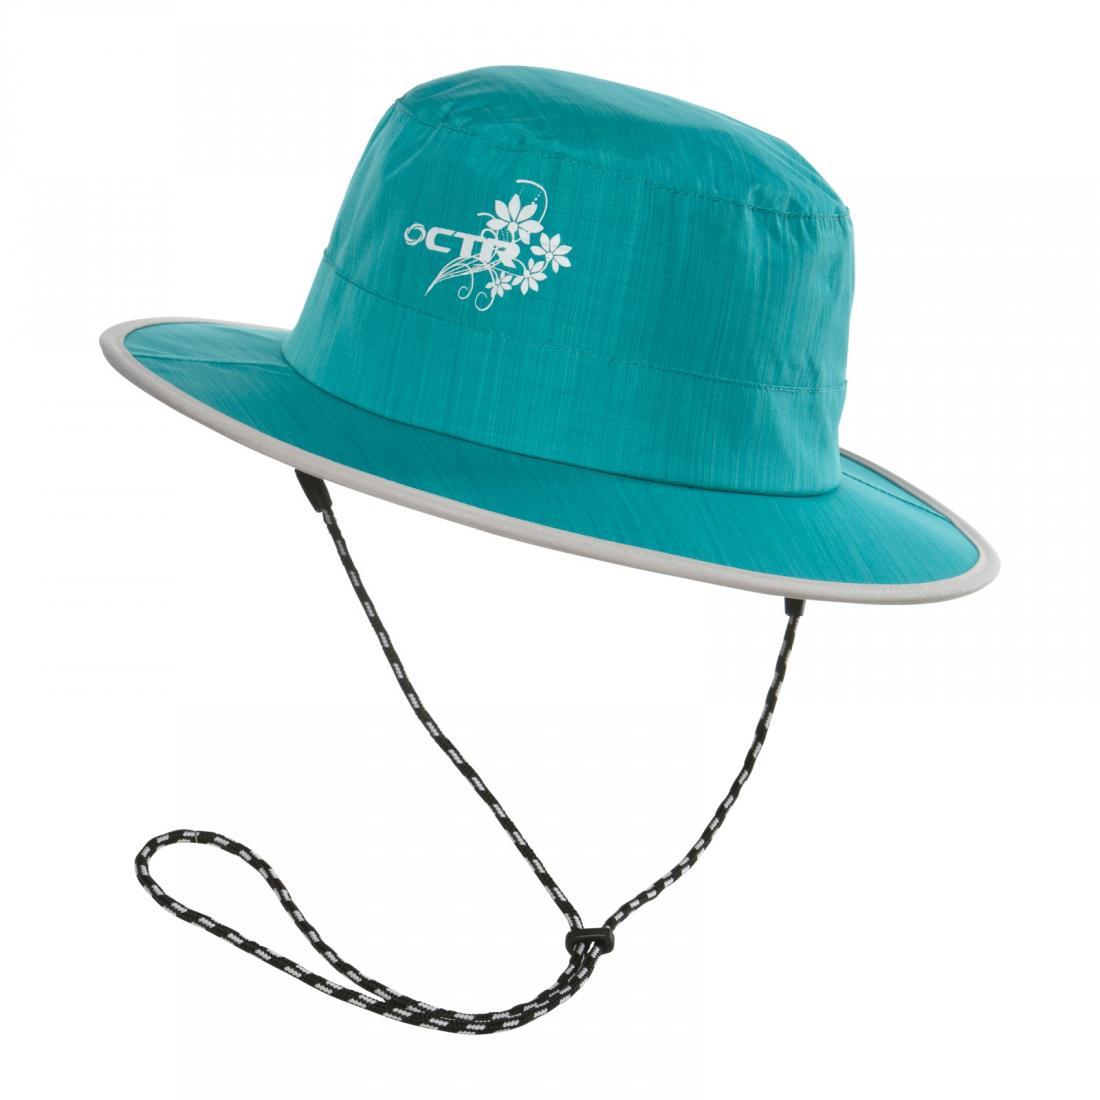 Панама Chaos  Stratus Bucket Hat (женс)Панамы<br><br><br>Цвет: Голубой<br>Размер: L-XL